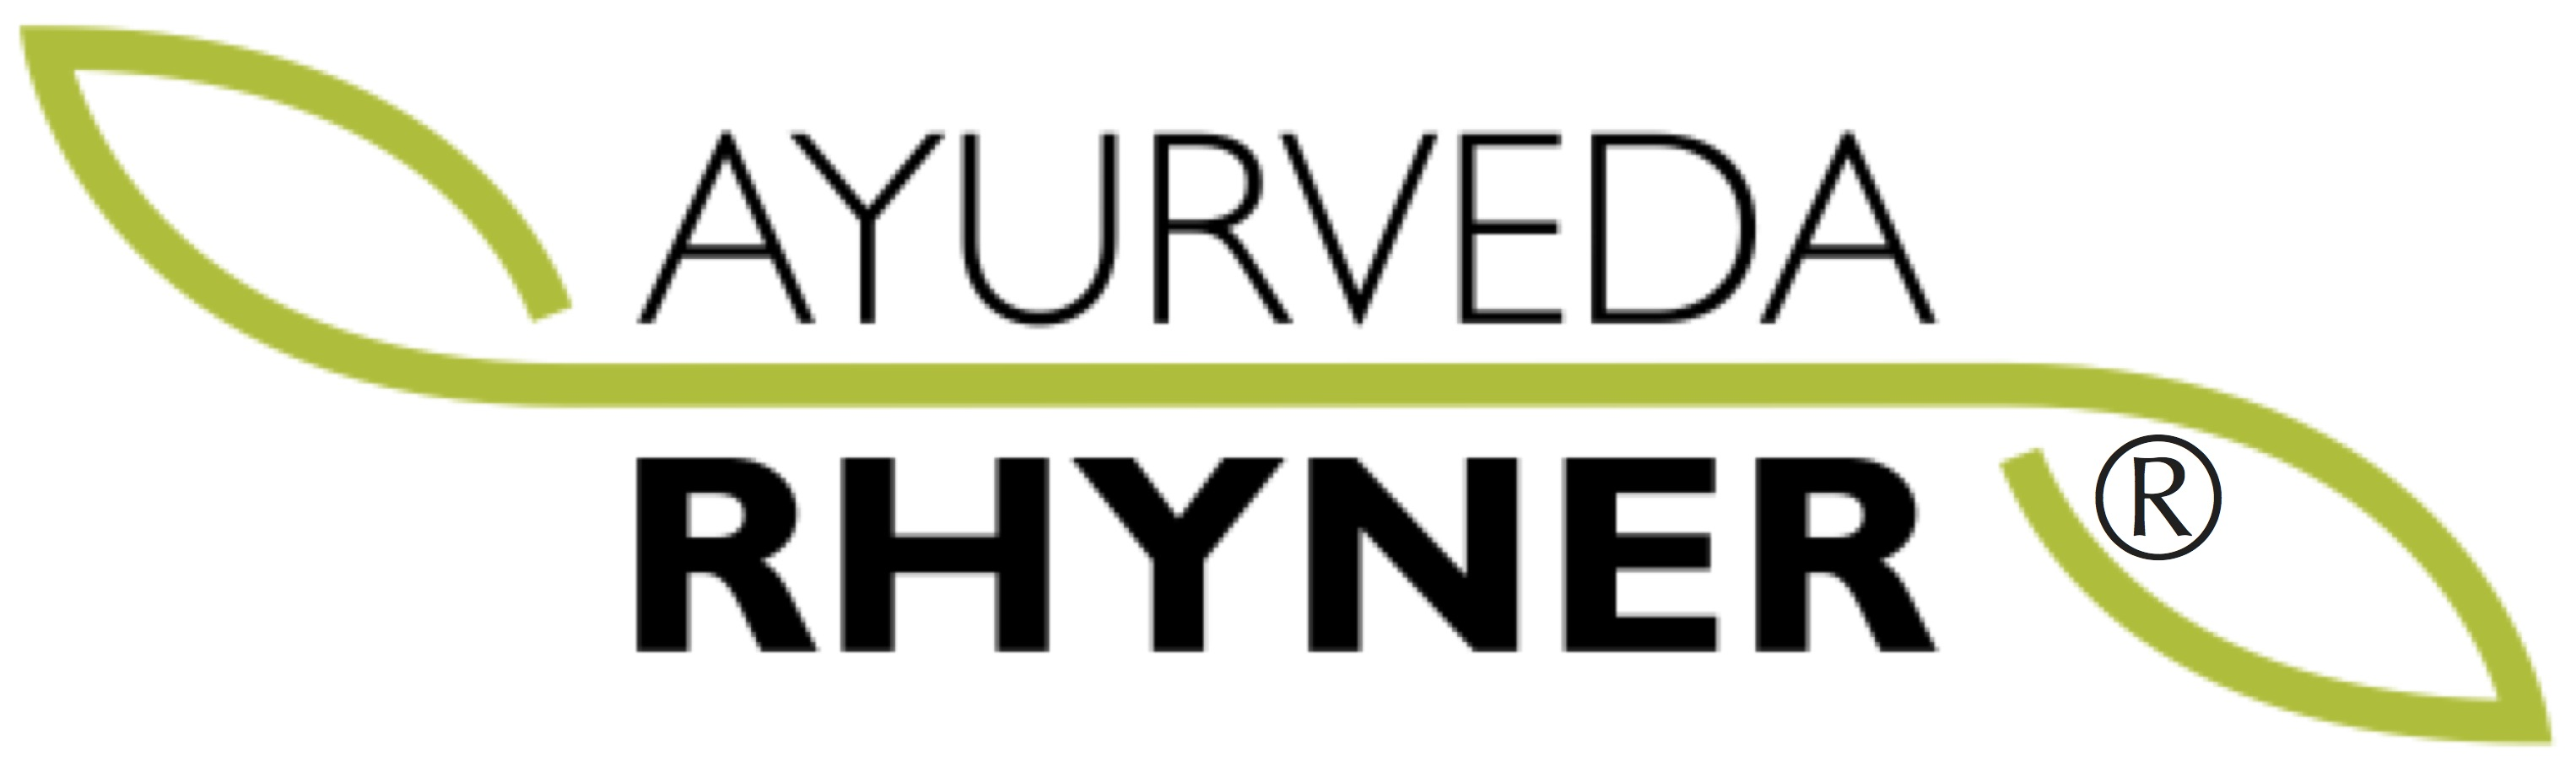 AYURVEDA RHYNER